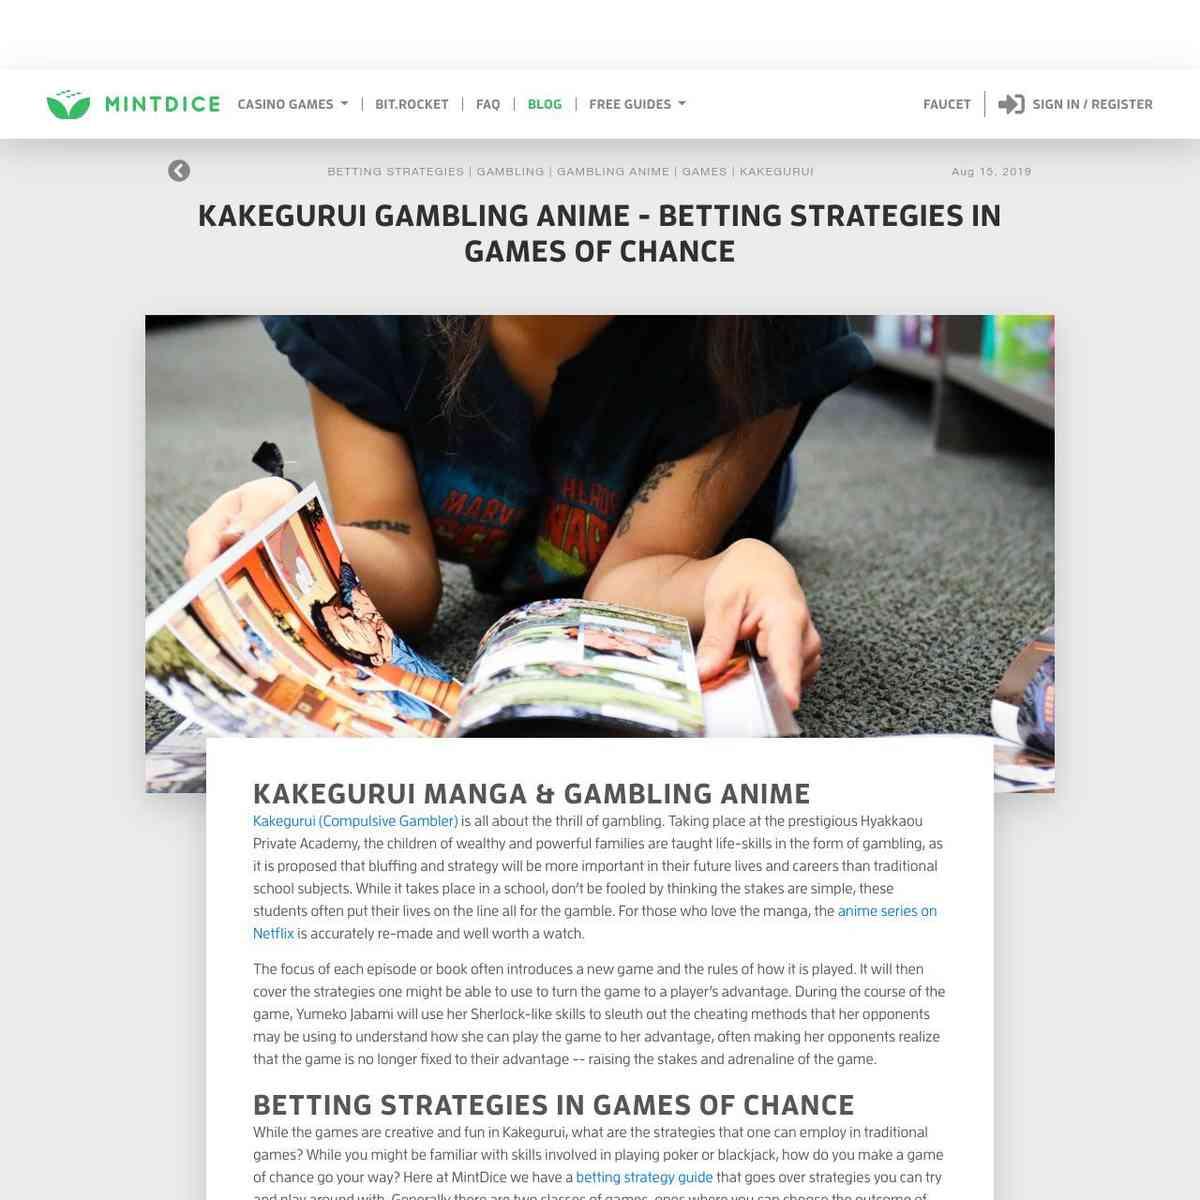 Kakegurui Gambling Anime - Betting Strategies in Games of Chance